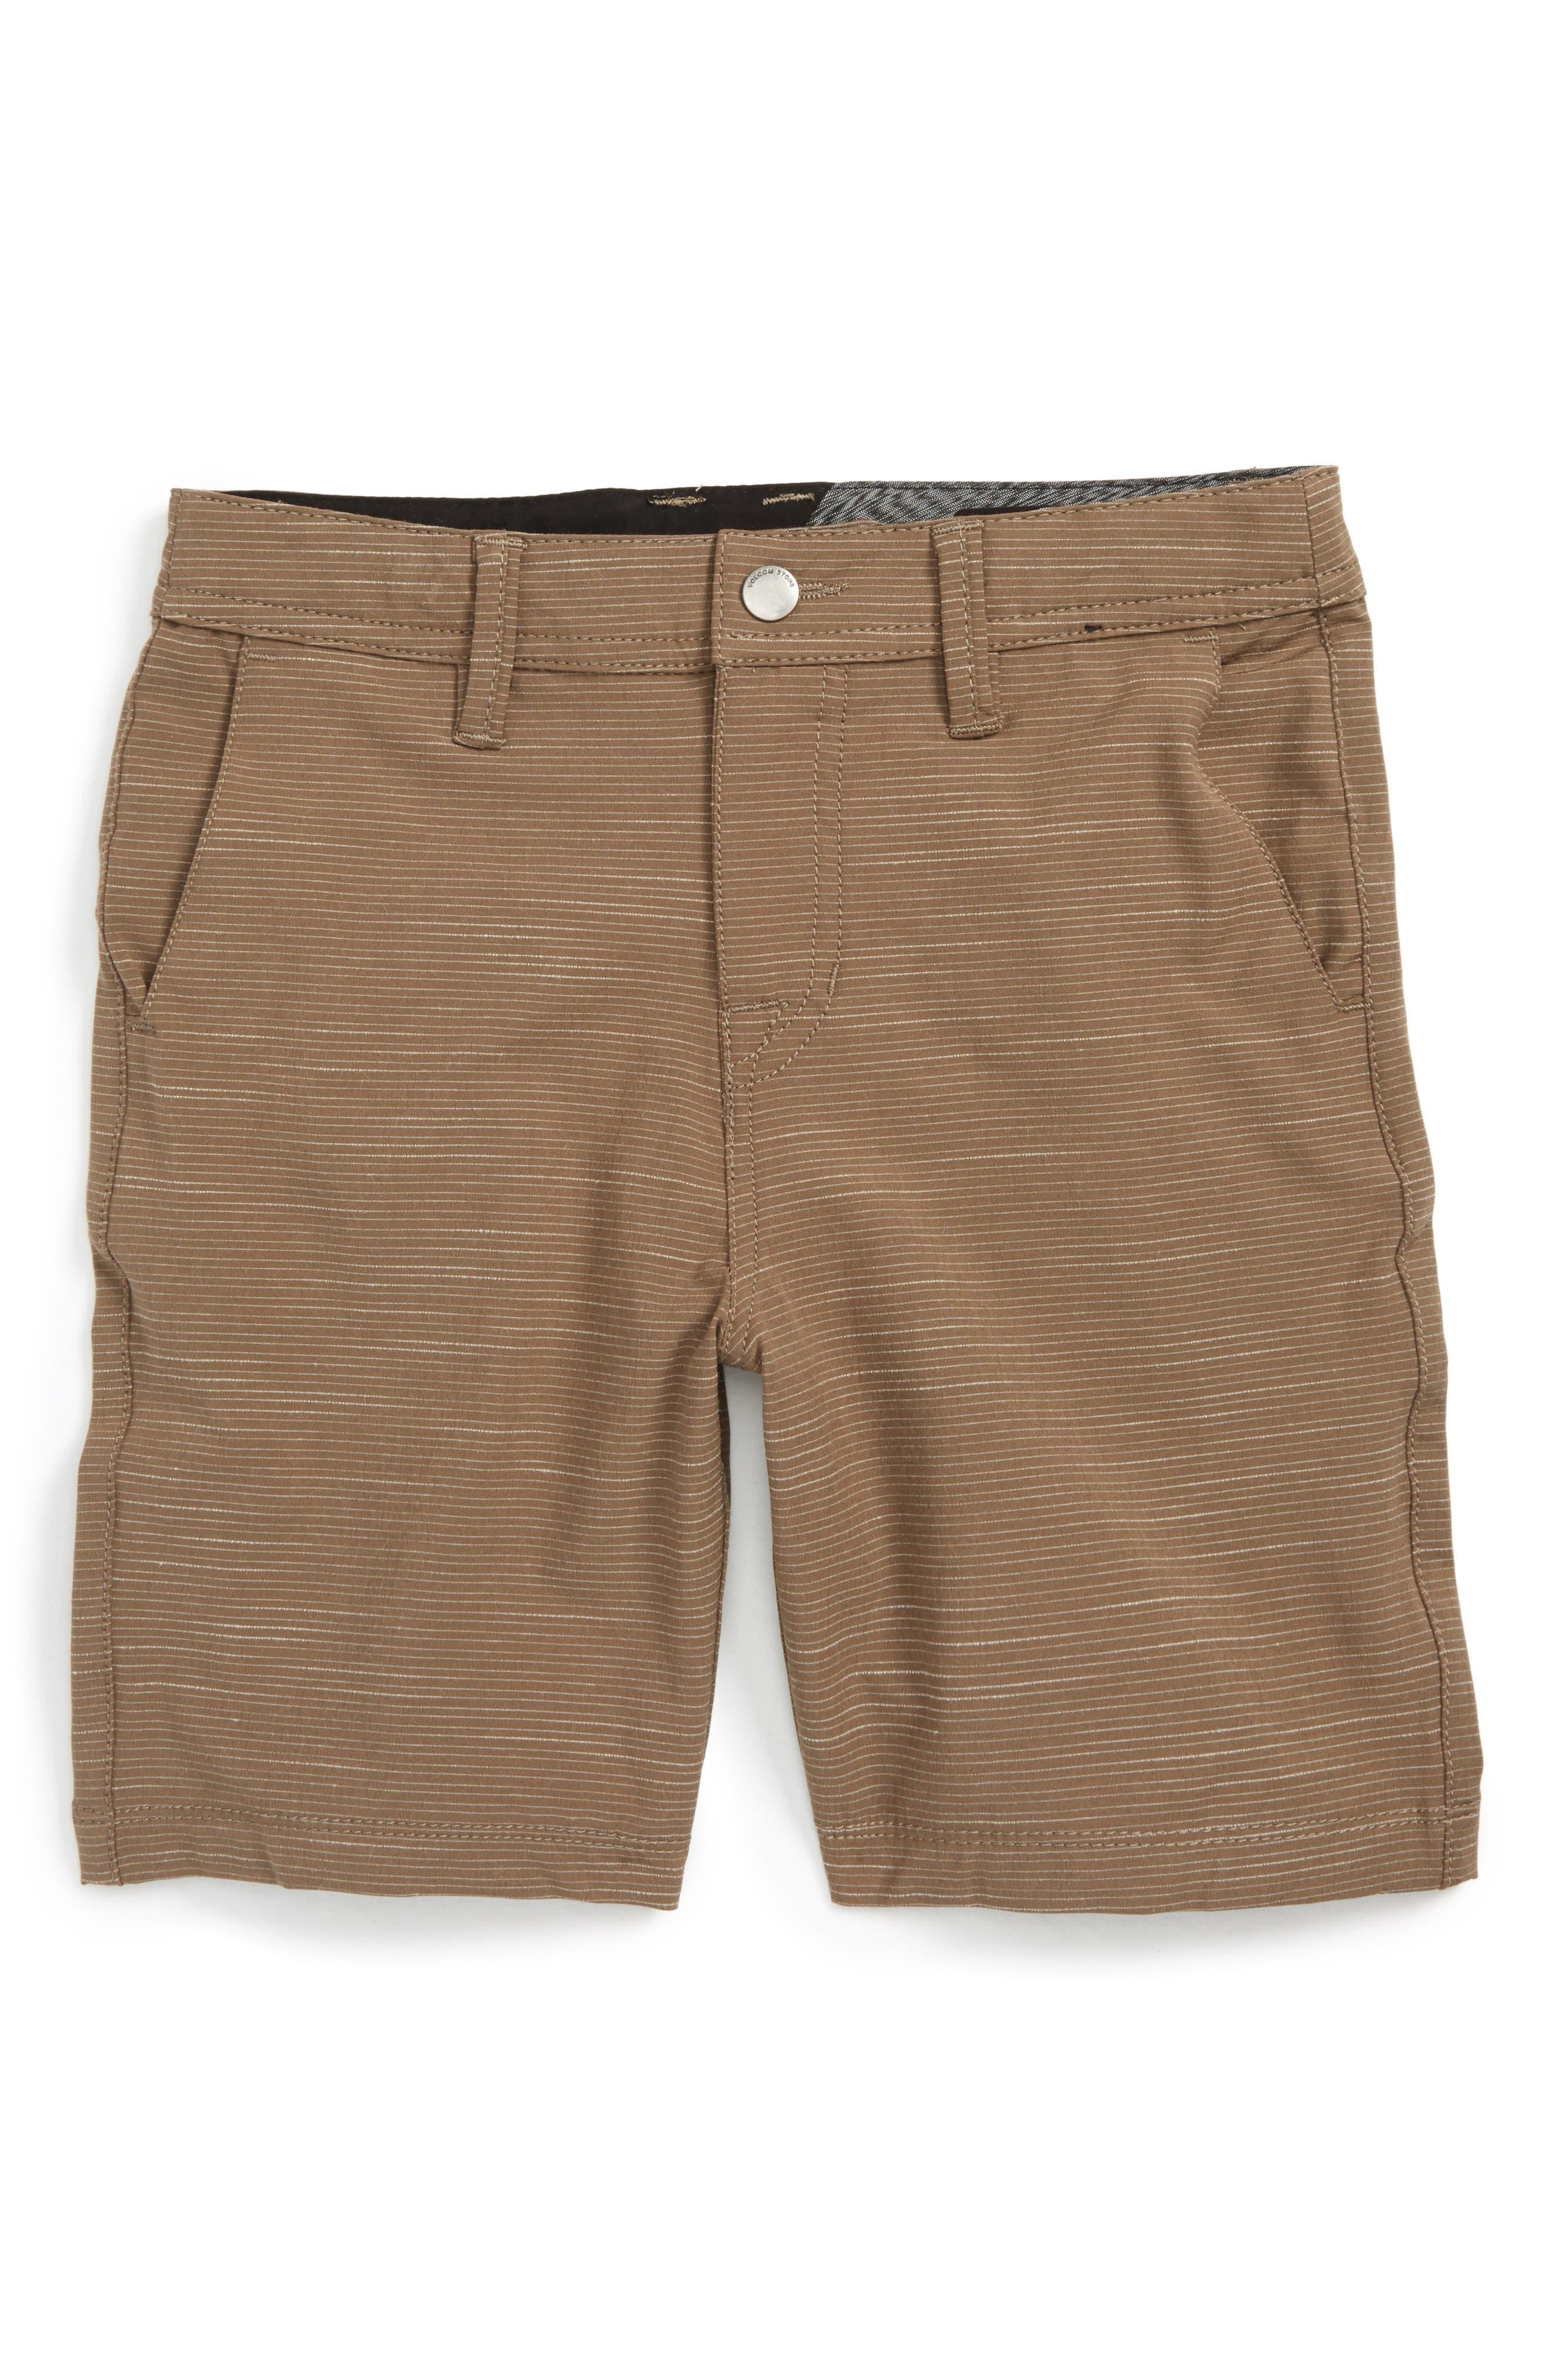 Surf N' Turf Hybrid Shorts,                             Main thumbnail 1, color,                             203